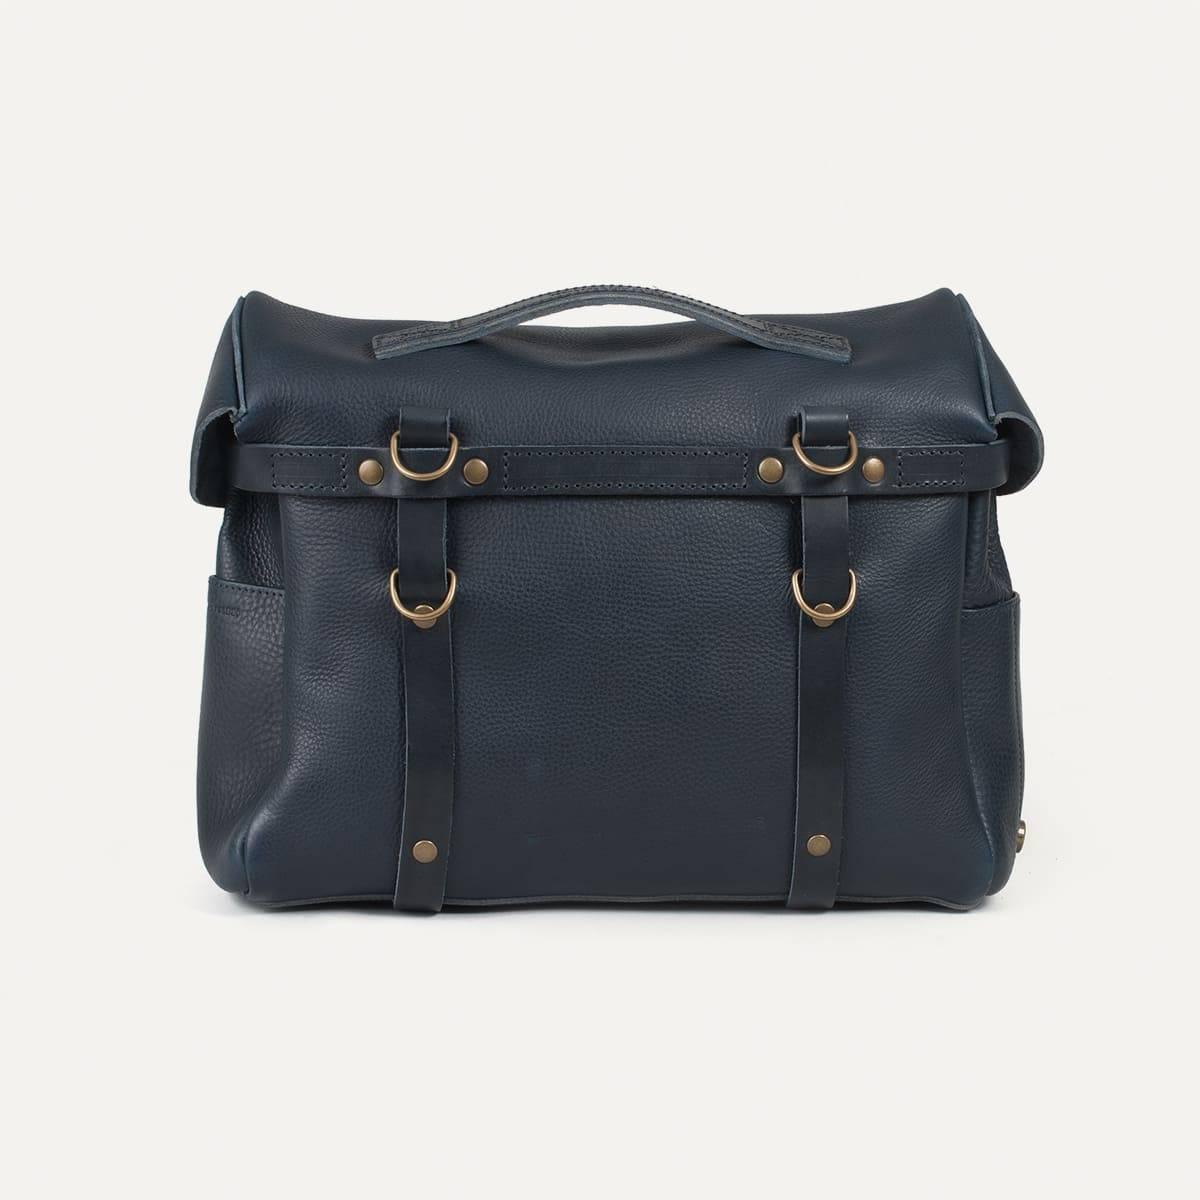 Bleu de Chauffe x Blitz Eclair bag - Navy (image n°4)